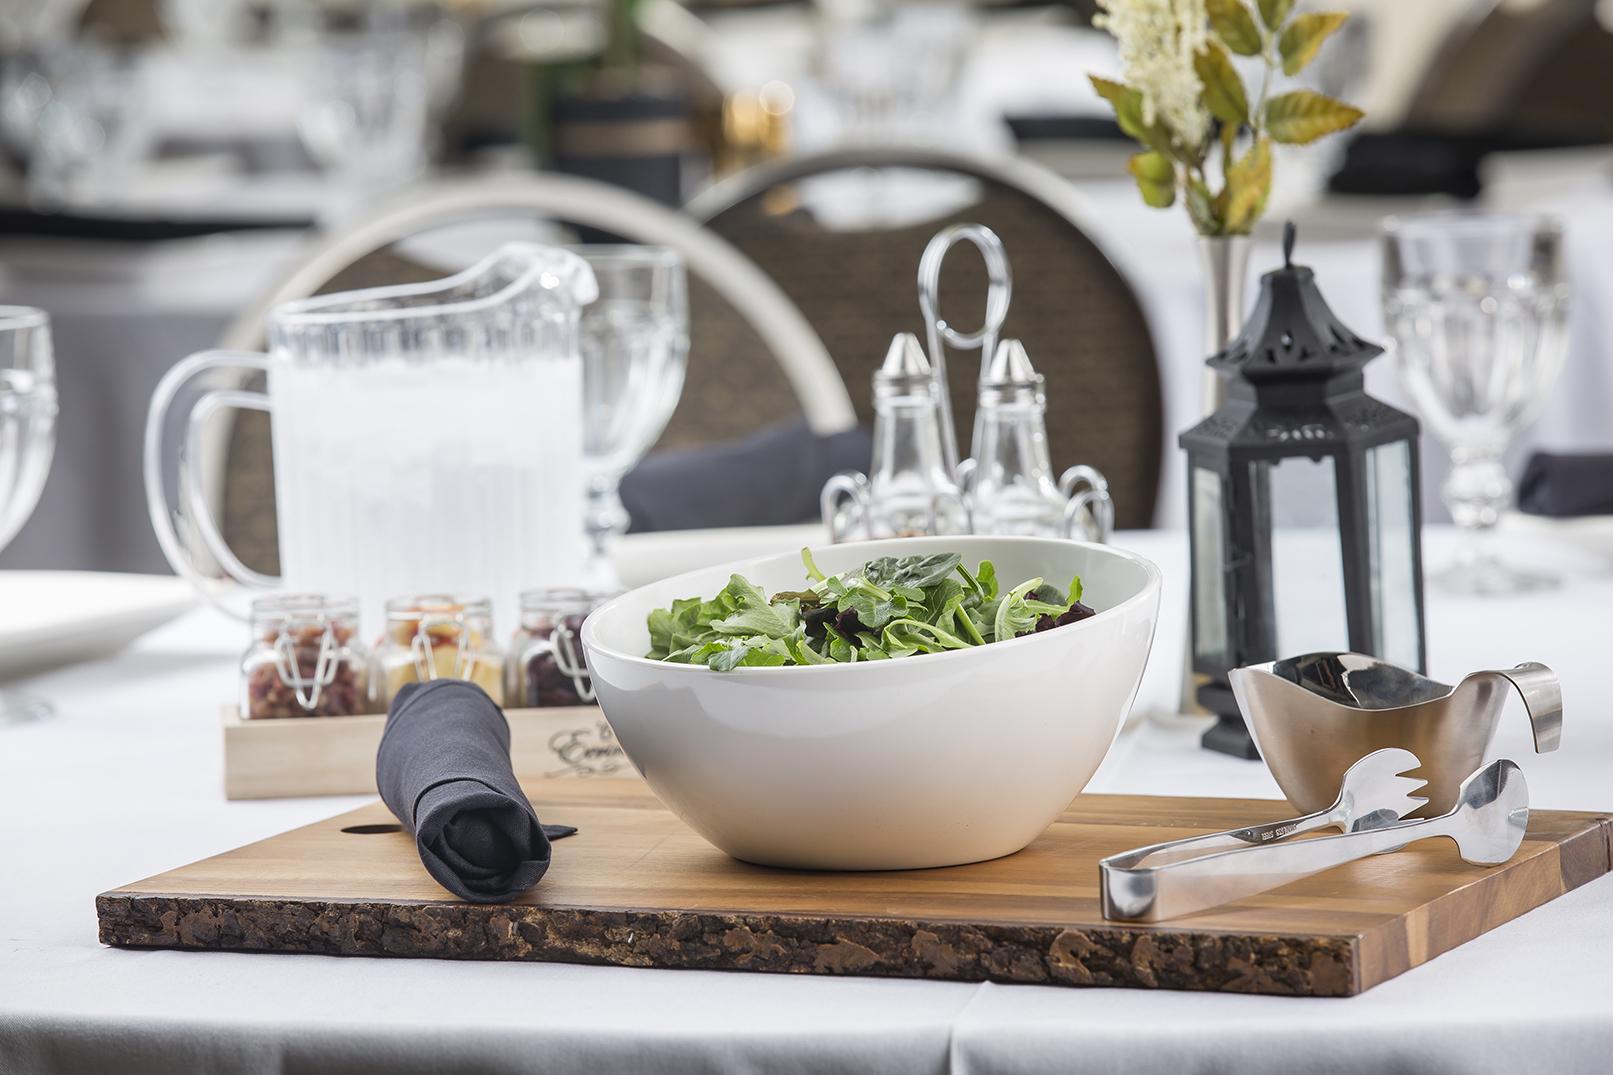 White melamine bowl with salad